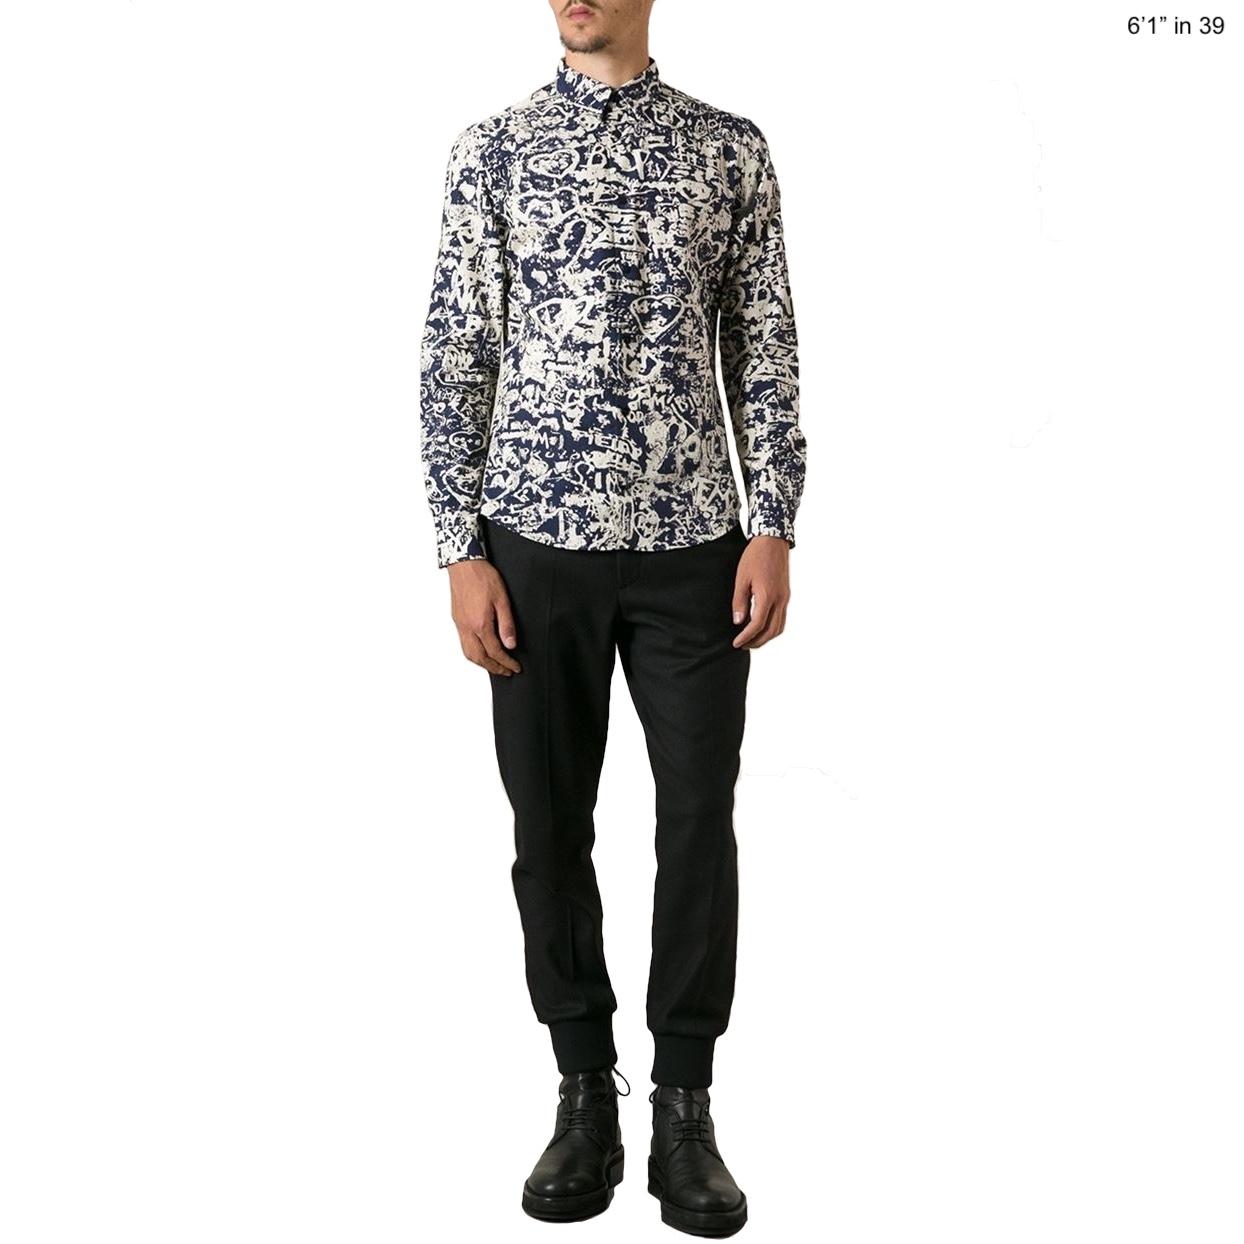 carven-blue-graffiti-print-shirt-product-1-22470459-1-267581142-normal.jpg